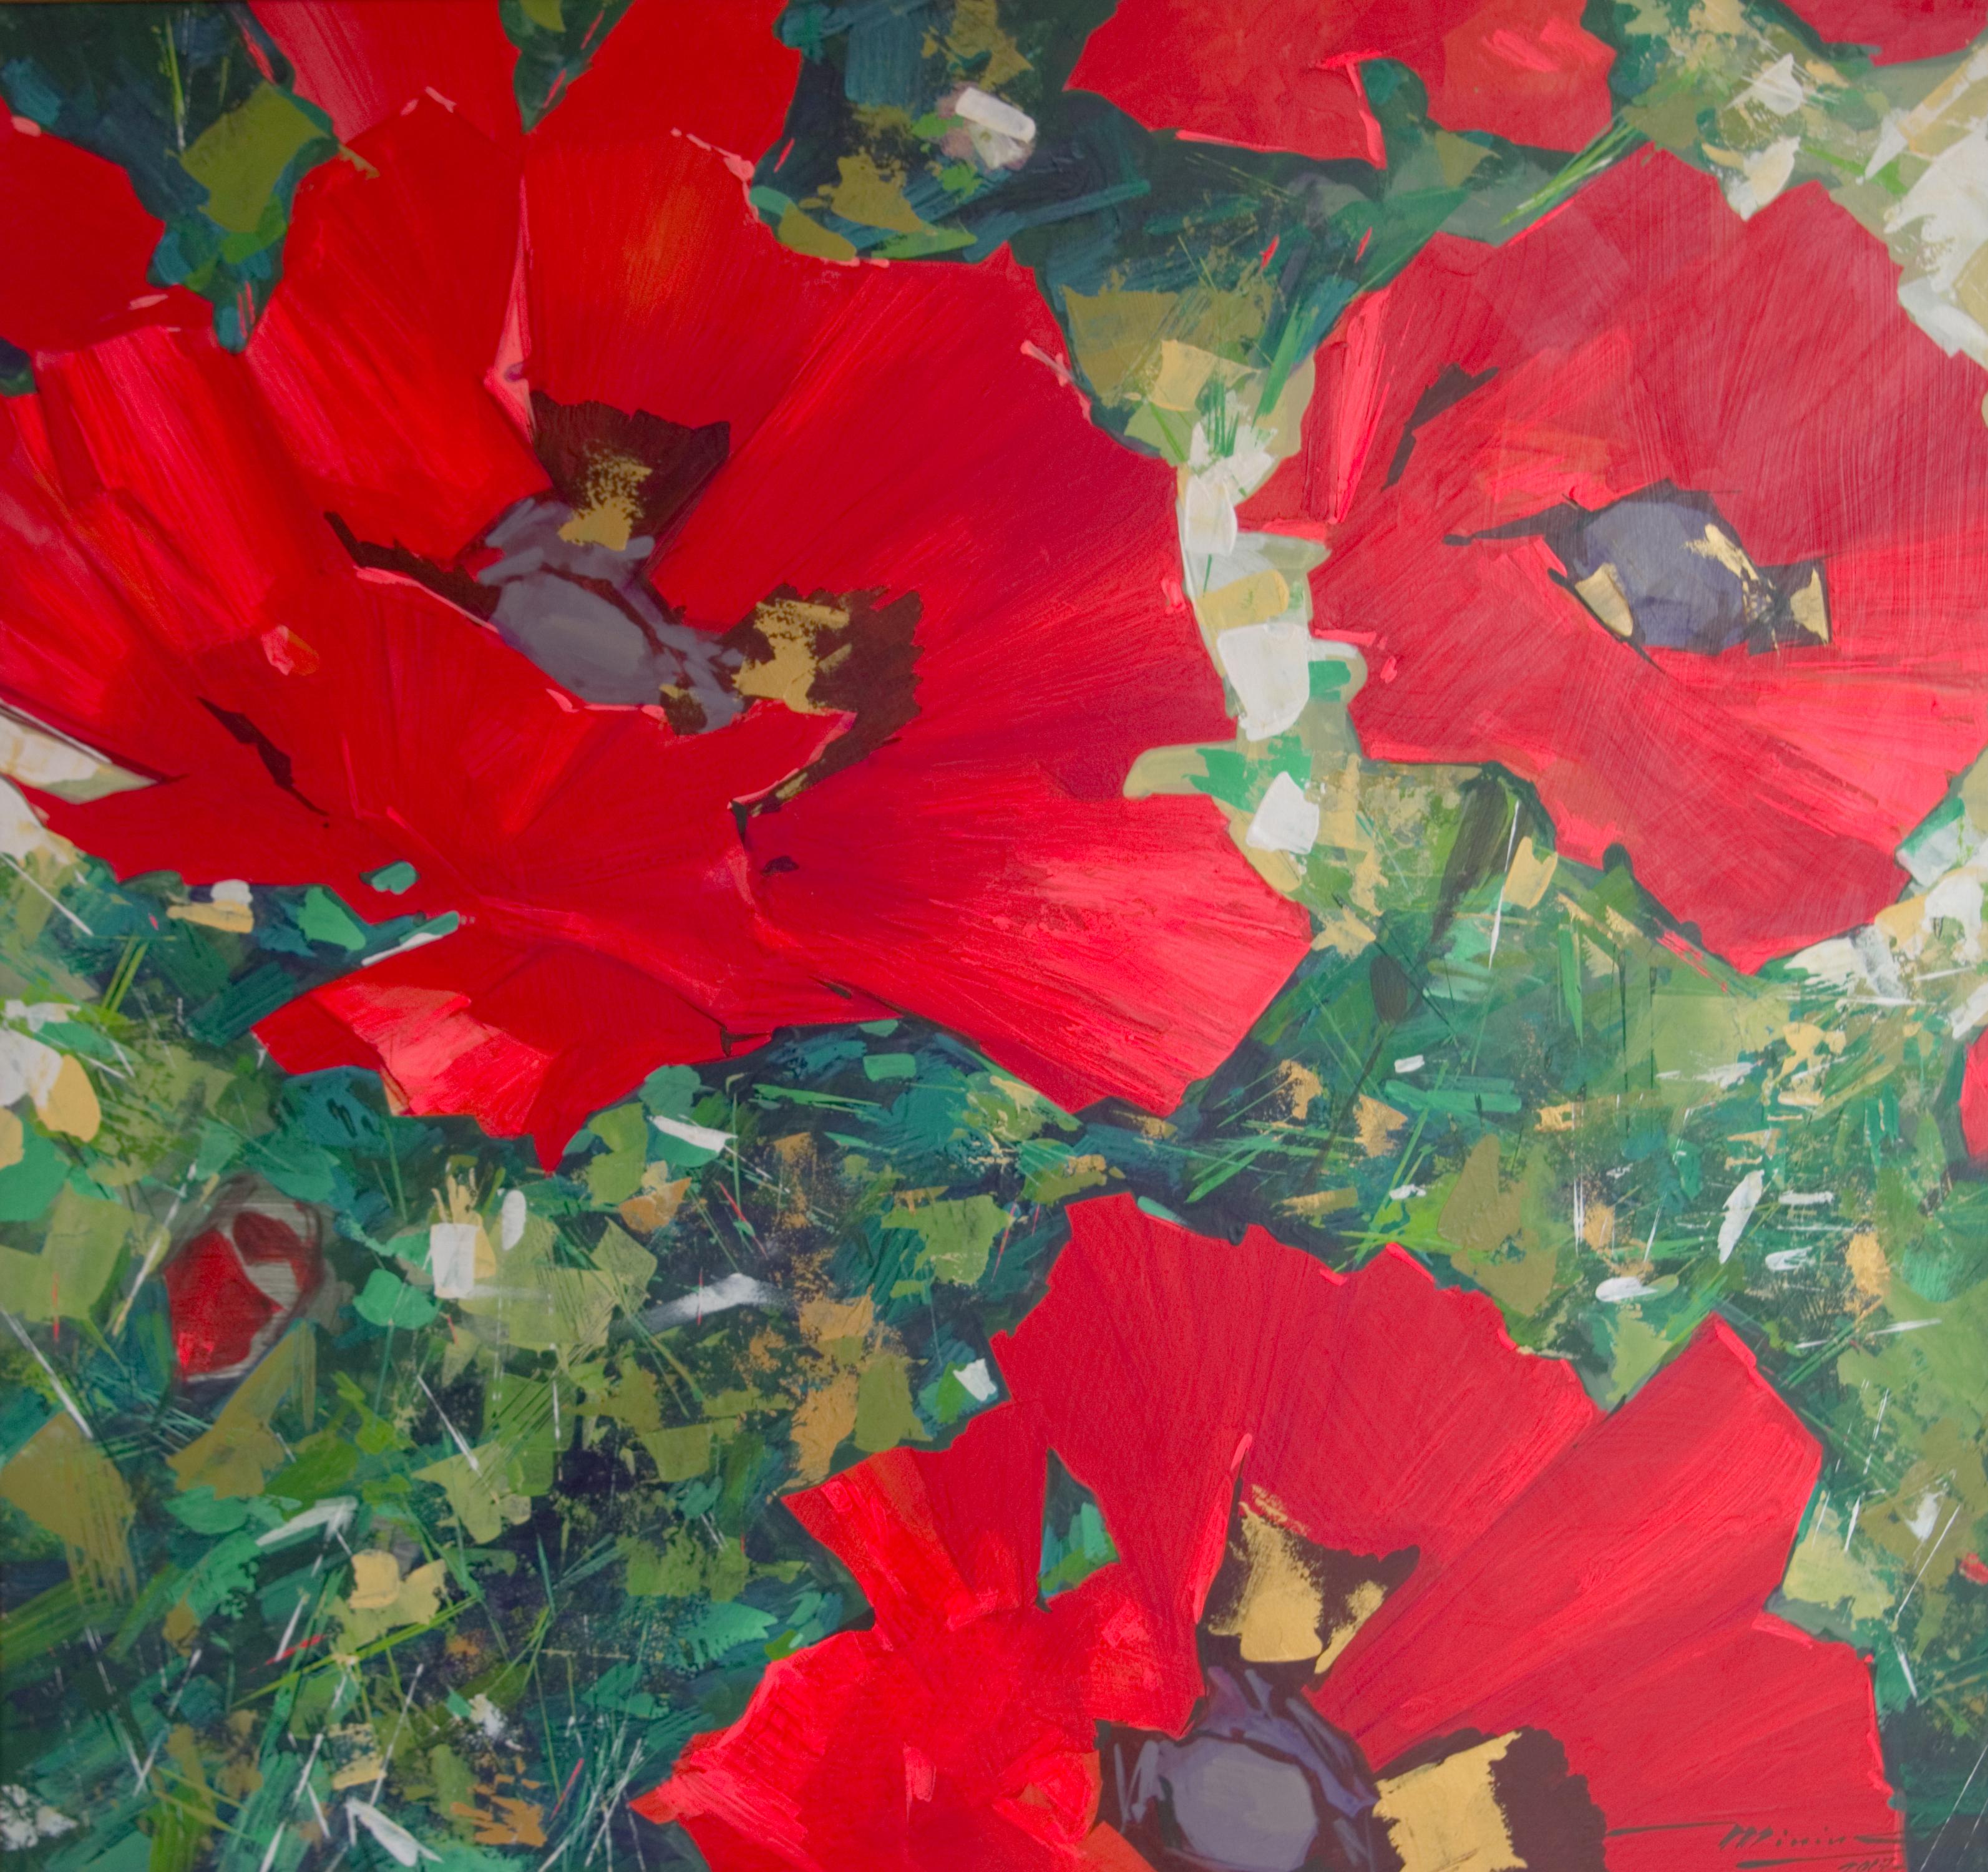 Big Poppies by Sergei Minin